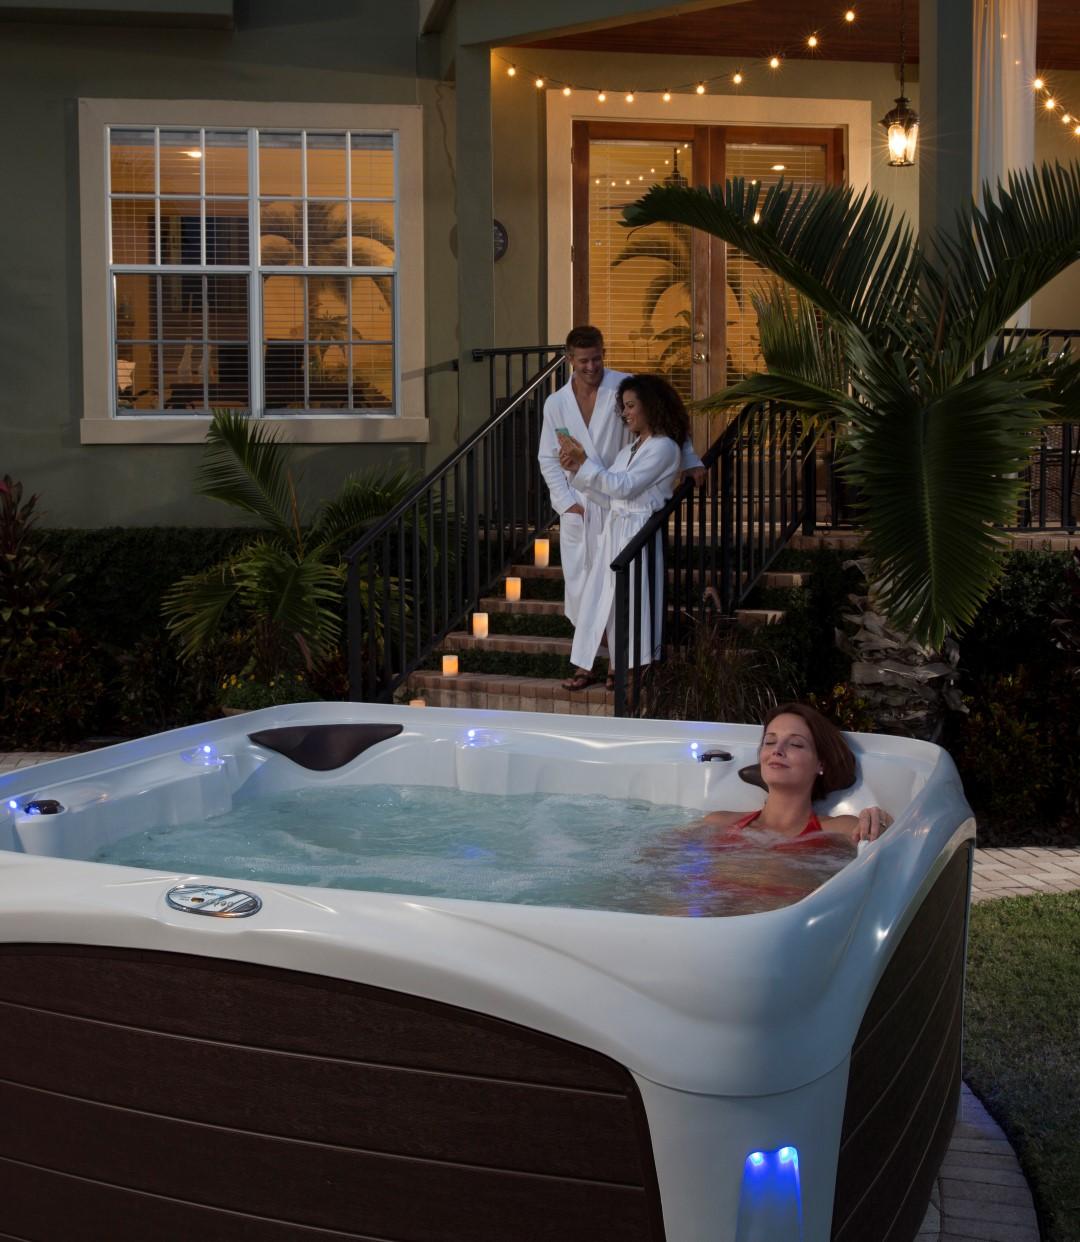 Dreammaker Dream 600l Hot Tub